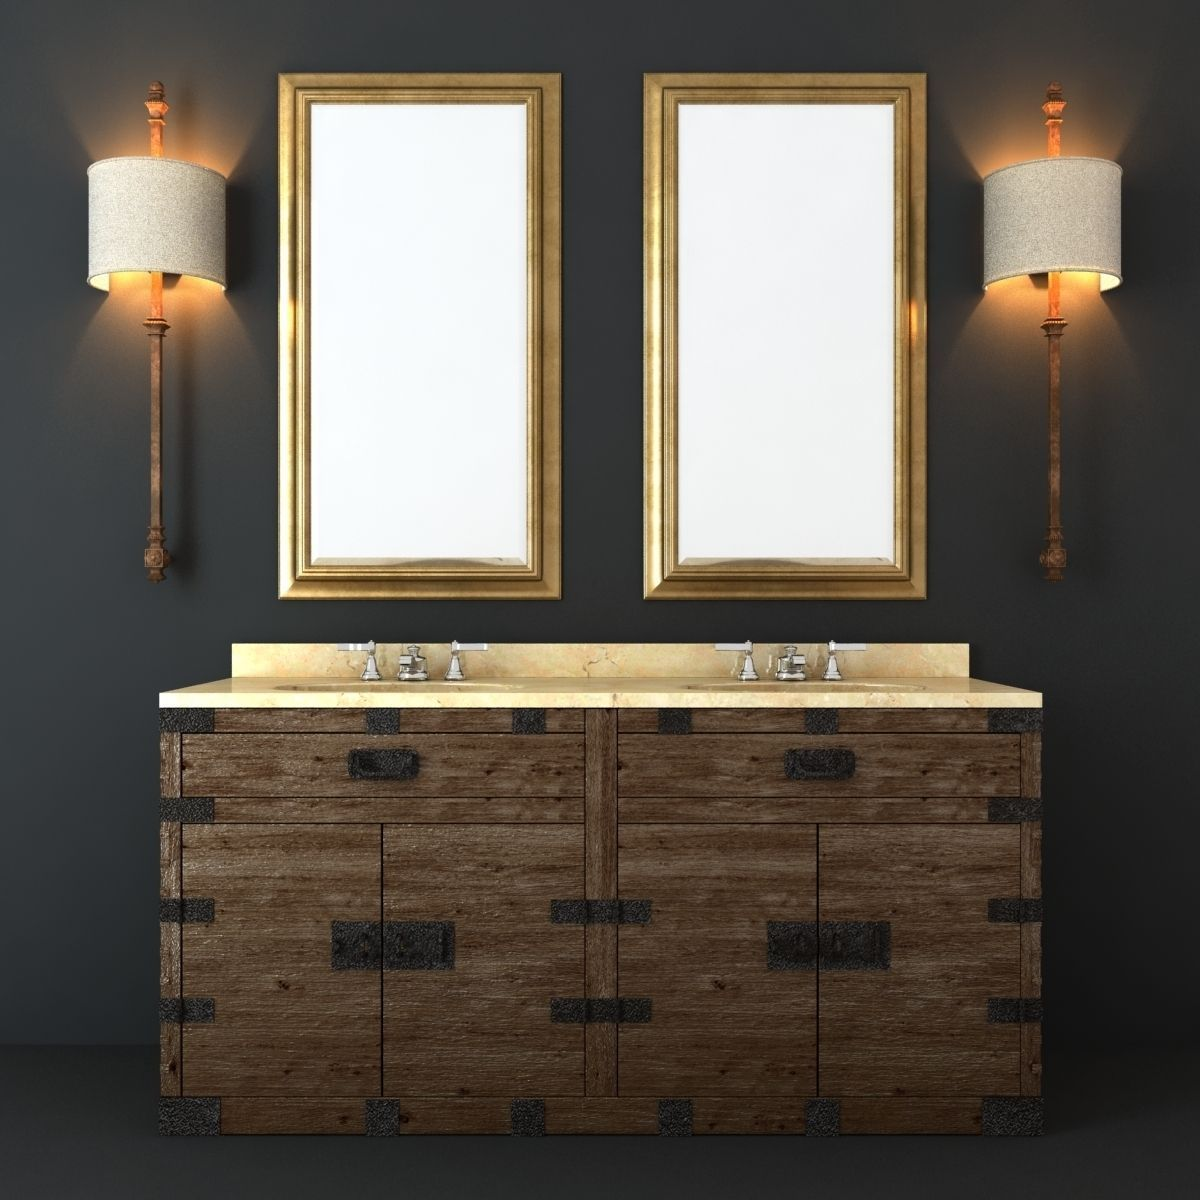 Restoration Hardware Bathroom Furniture Set D Model MAX OBJ FBX MTL - Restoration bathroom